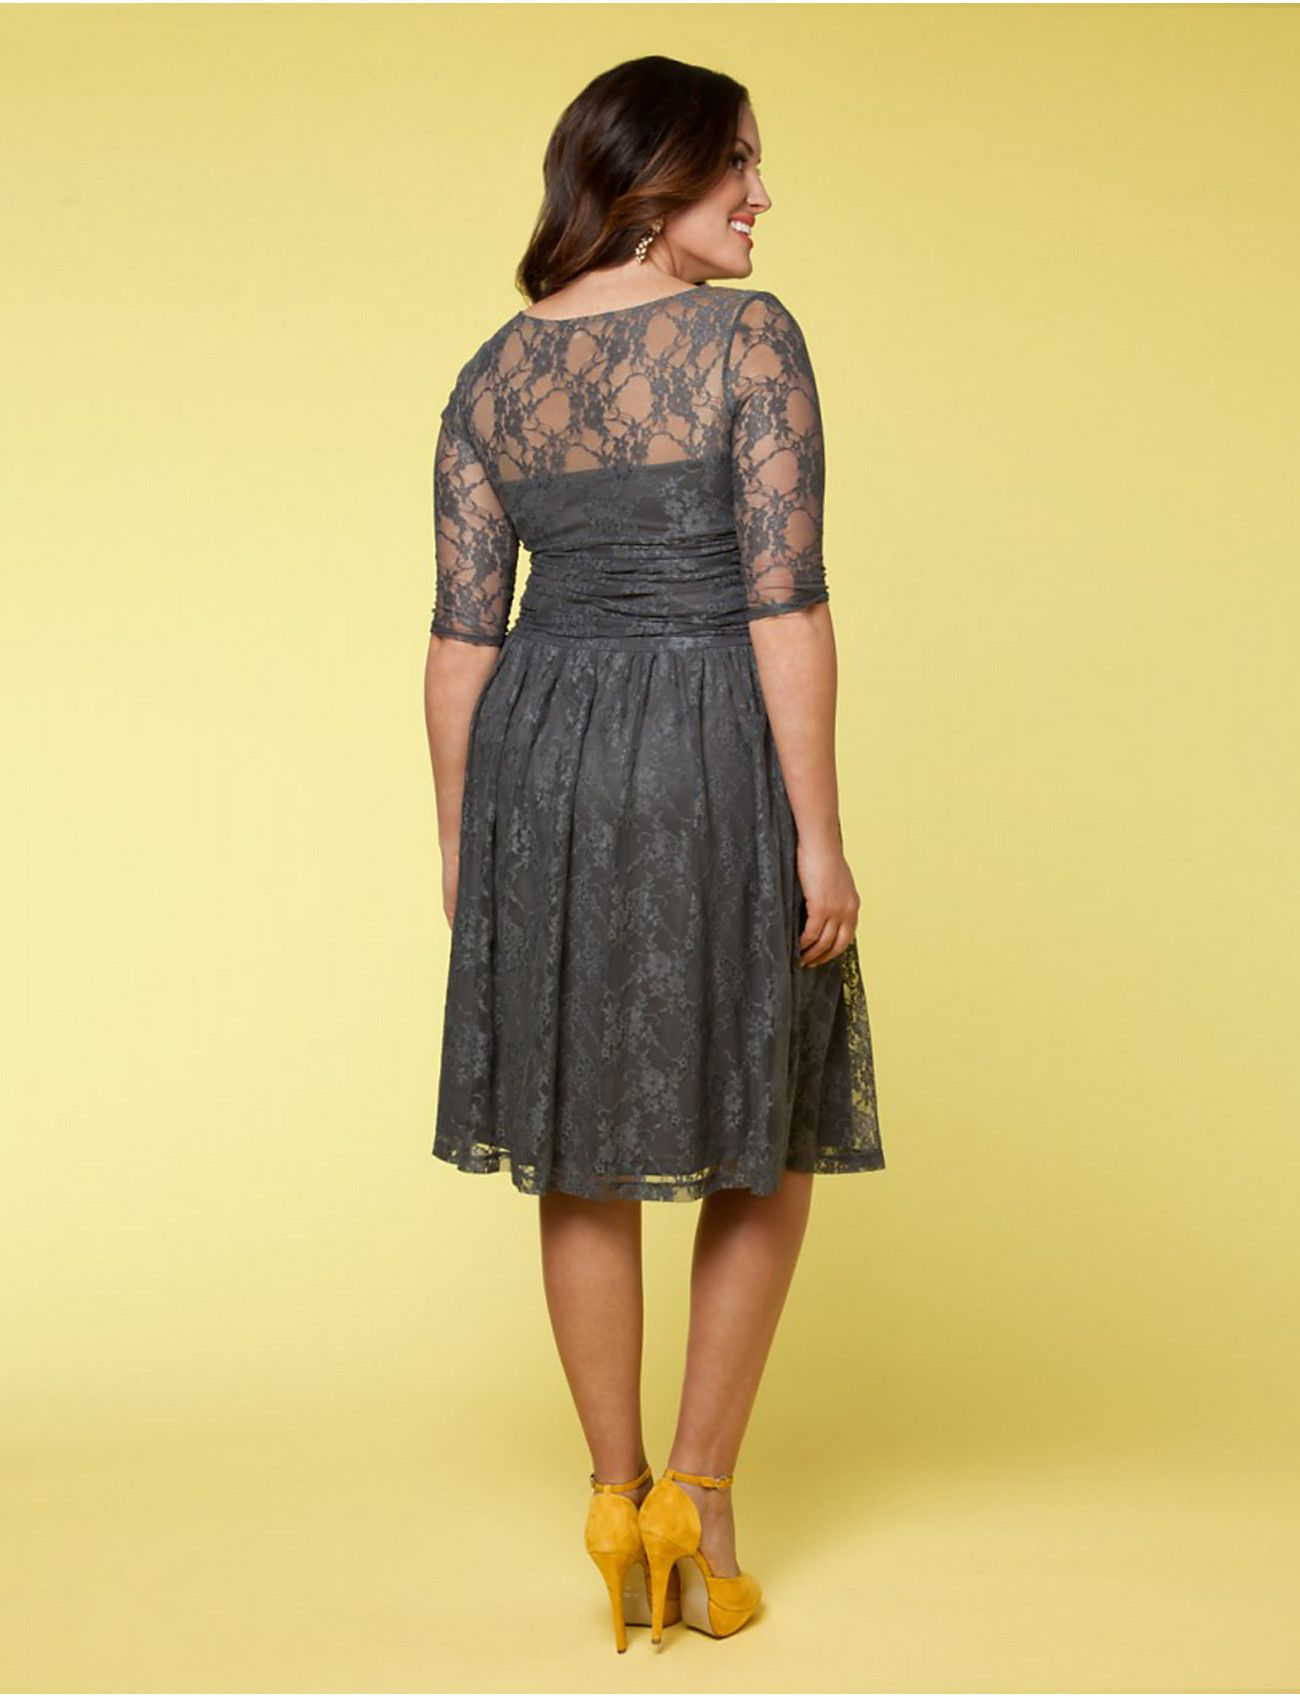 Luna lace dress lane bryant style pinterest lace dress